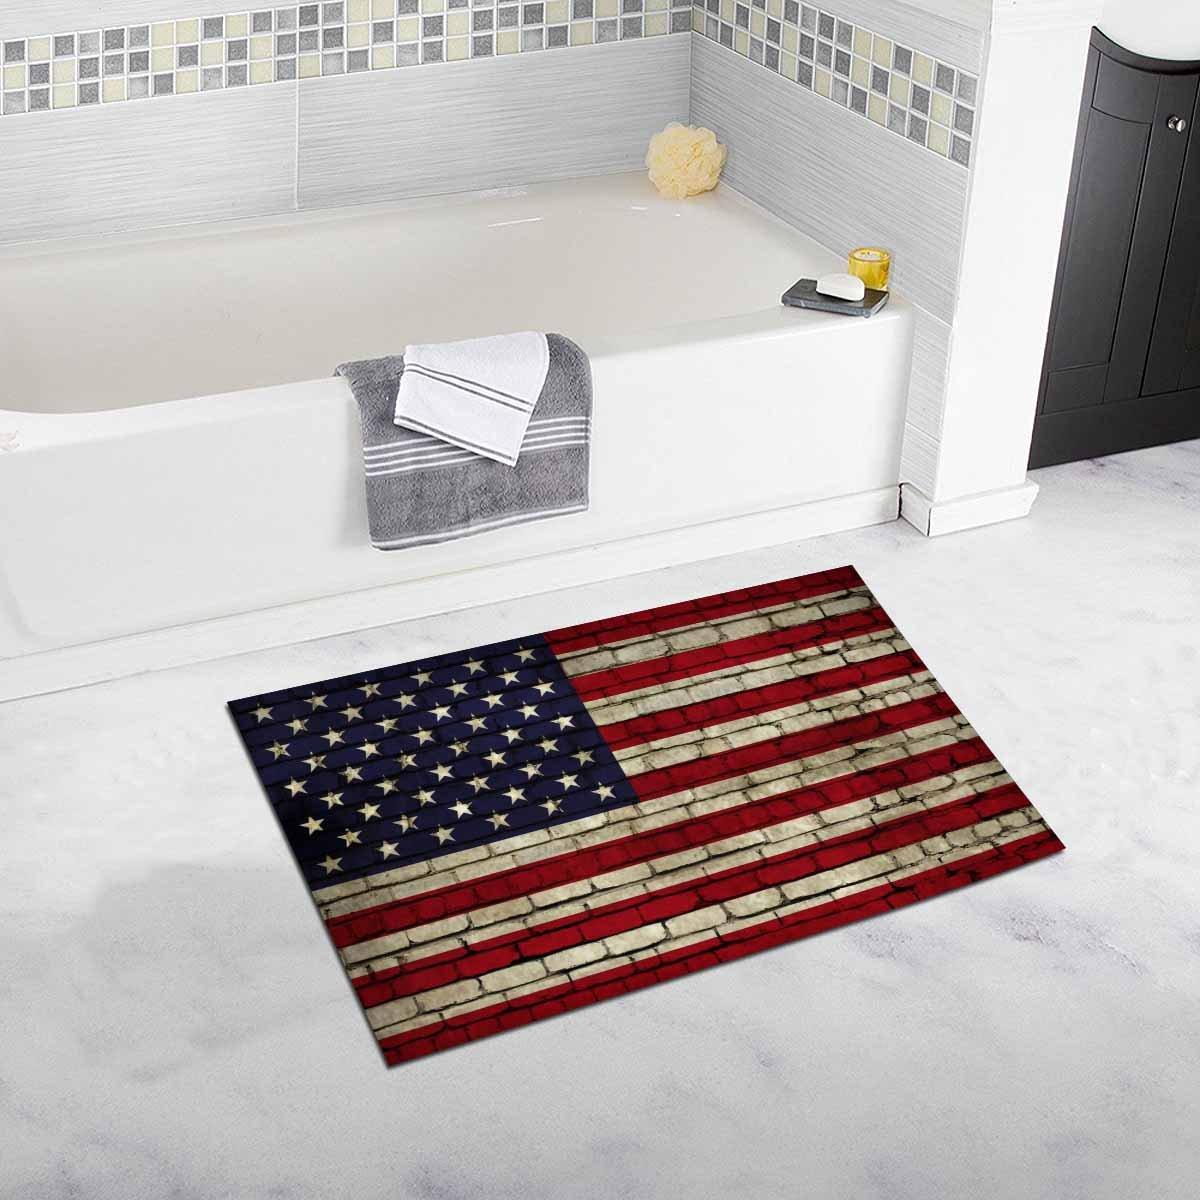 InterestPrint American Flag on the Wall Bath Rug Non-slip Bathroom Mat 20W X 32L Inches